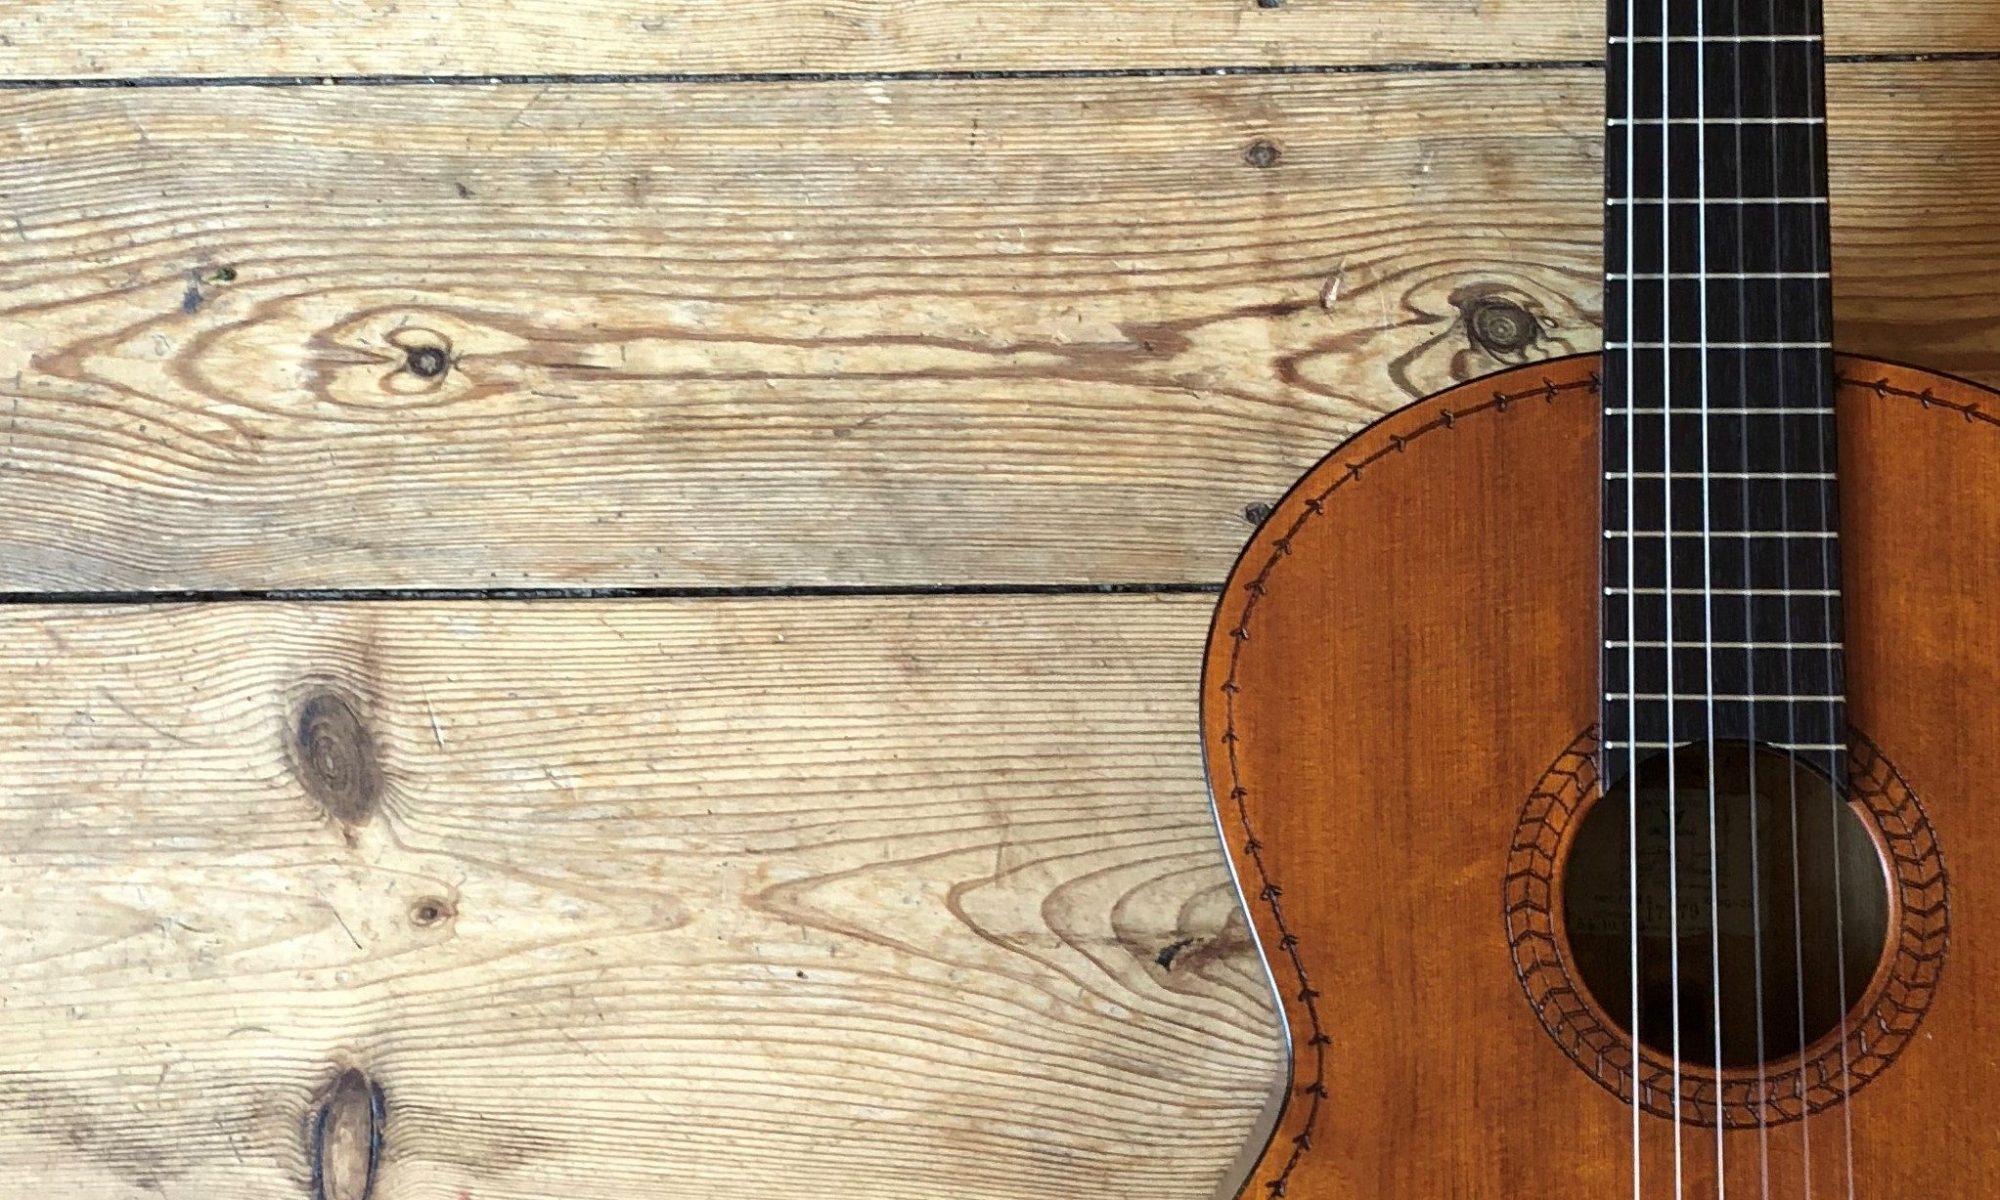 Die alte gitarre